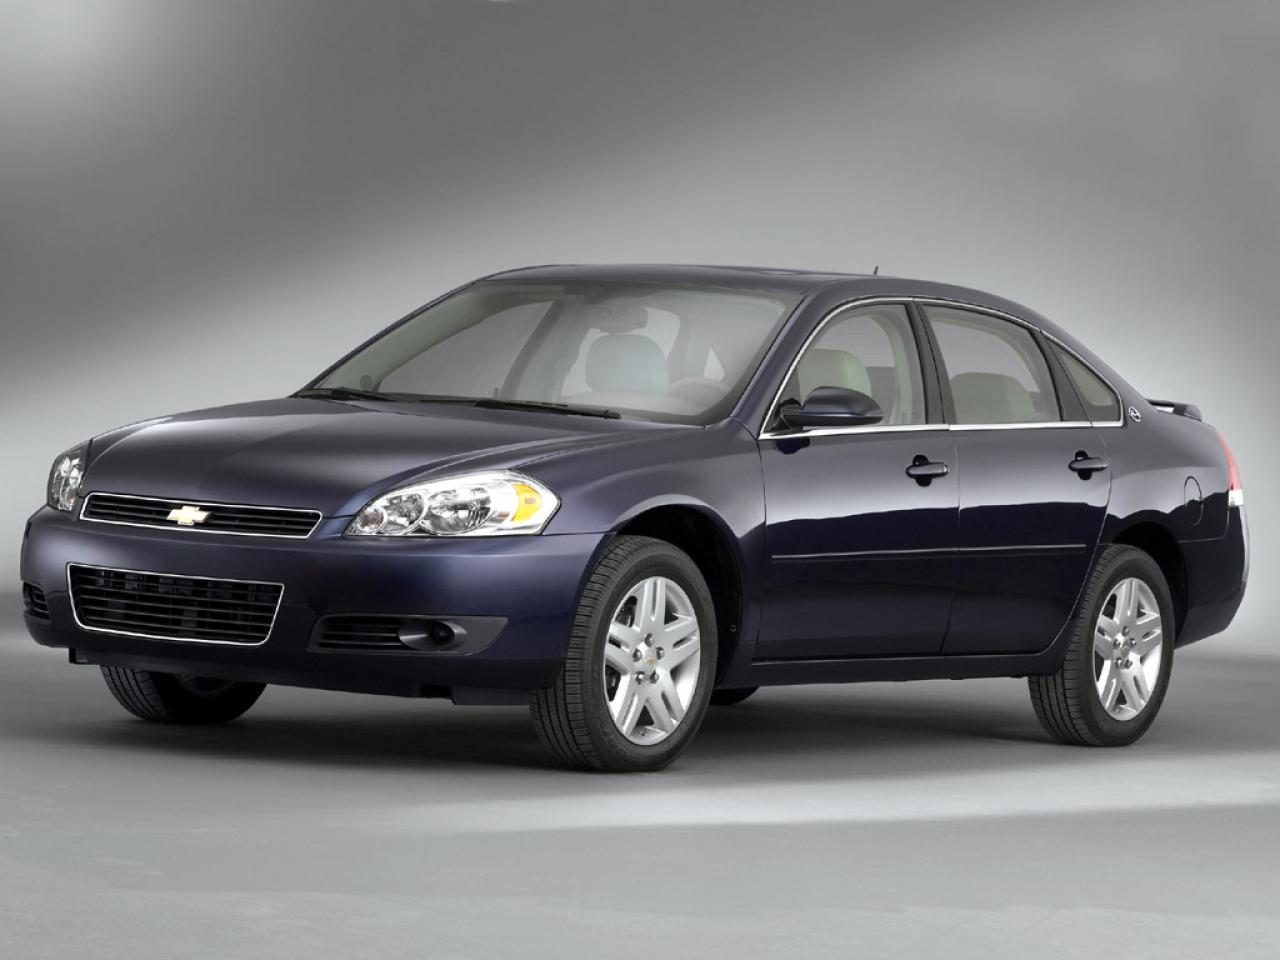 2006 Chevrolet Impala Information And Photos Zombiedrive 3 8 Liter Gm Engine Diagram 800 1024 1280 1600 Origin